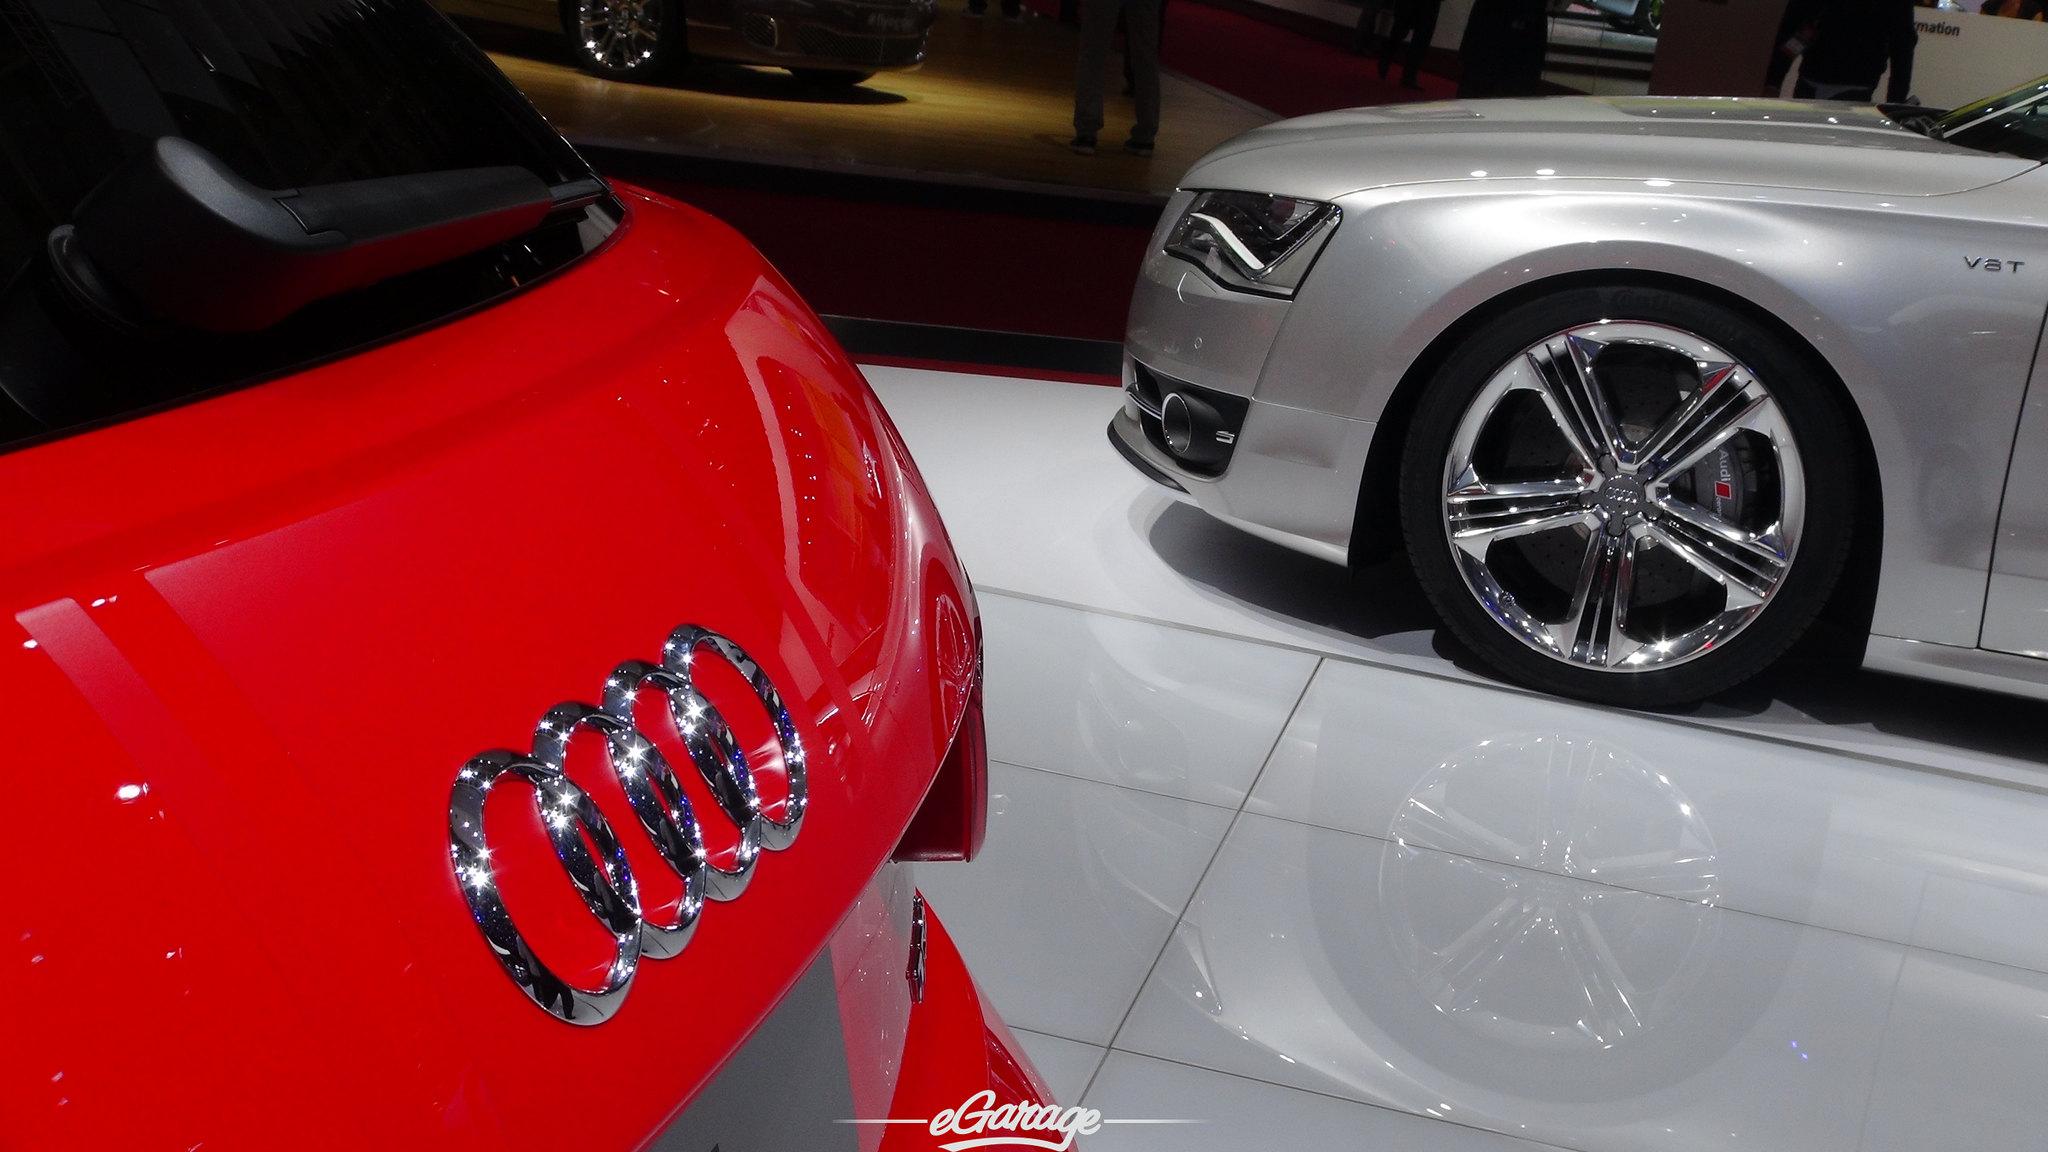 8037670734 353d1beb5b k 2012 Paris Motor Show